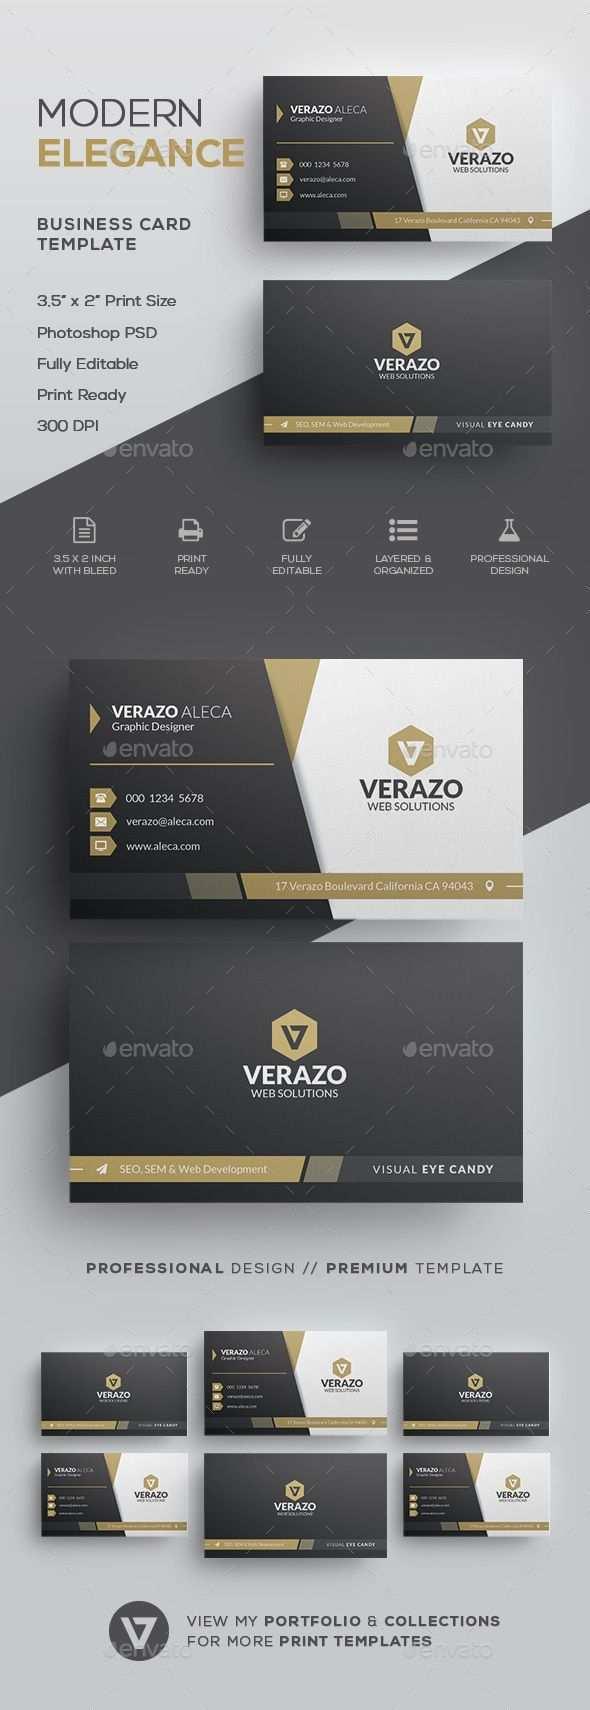 20 Free Printable Business Card Template Keynote in Photoshop for Business Card Template Keynote